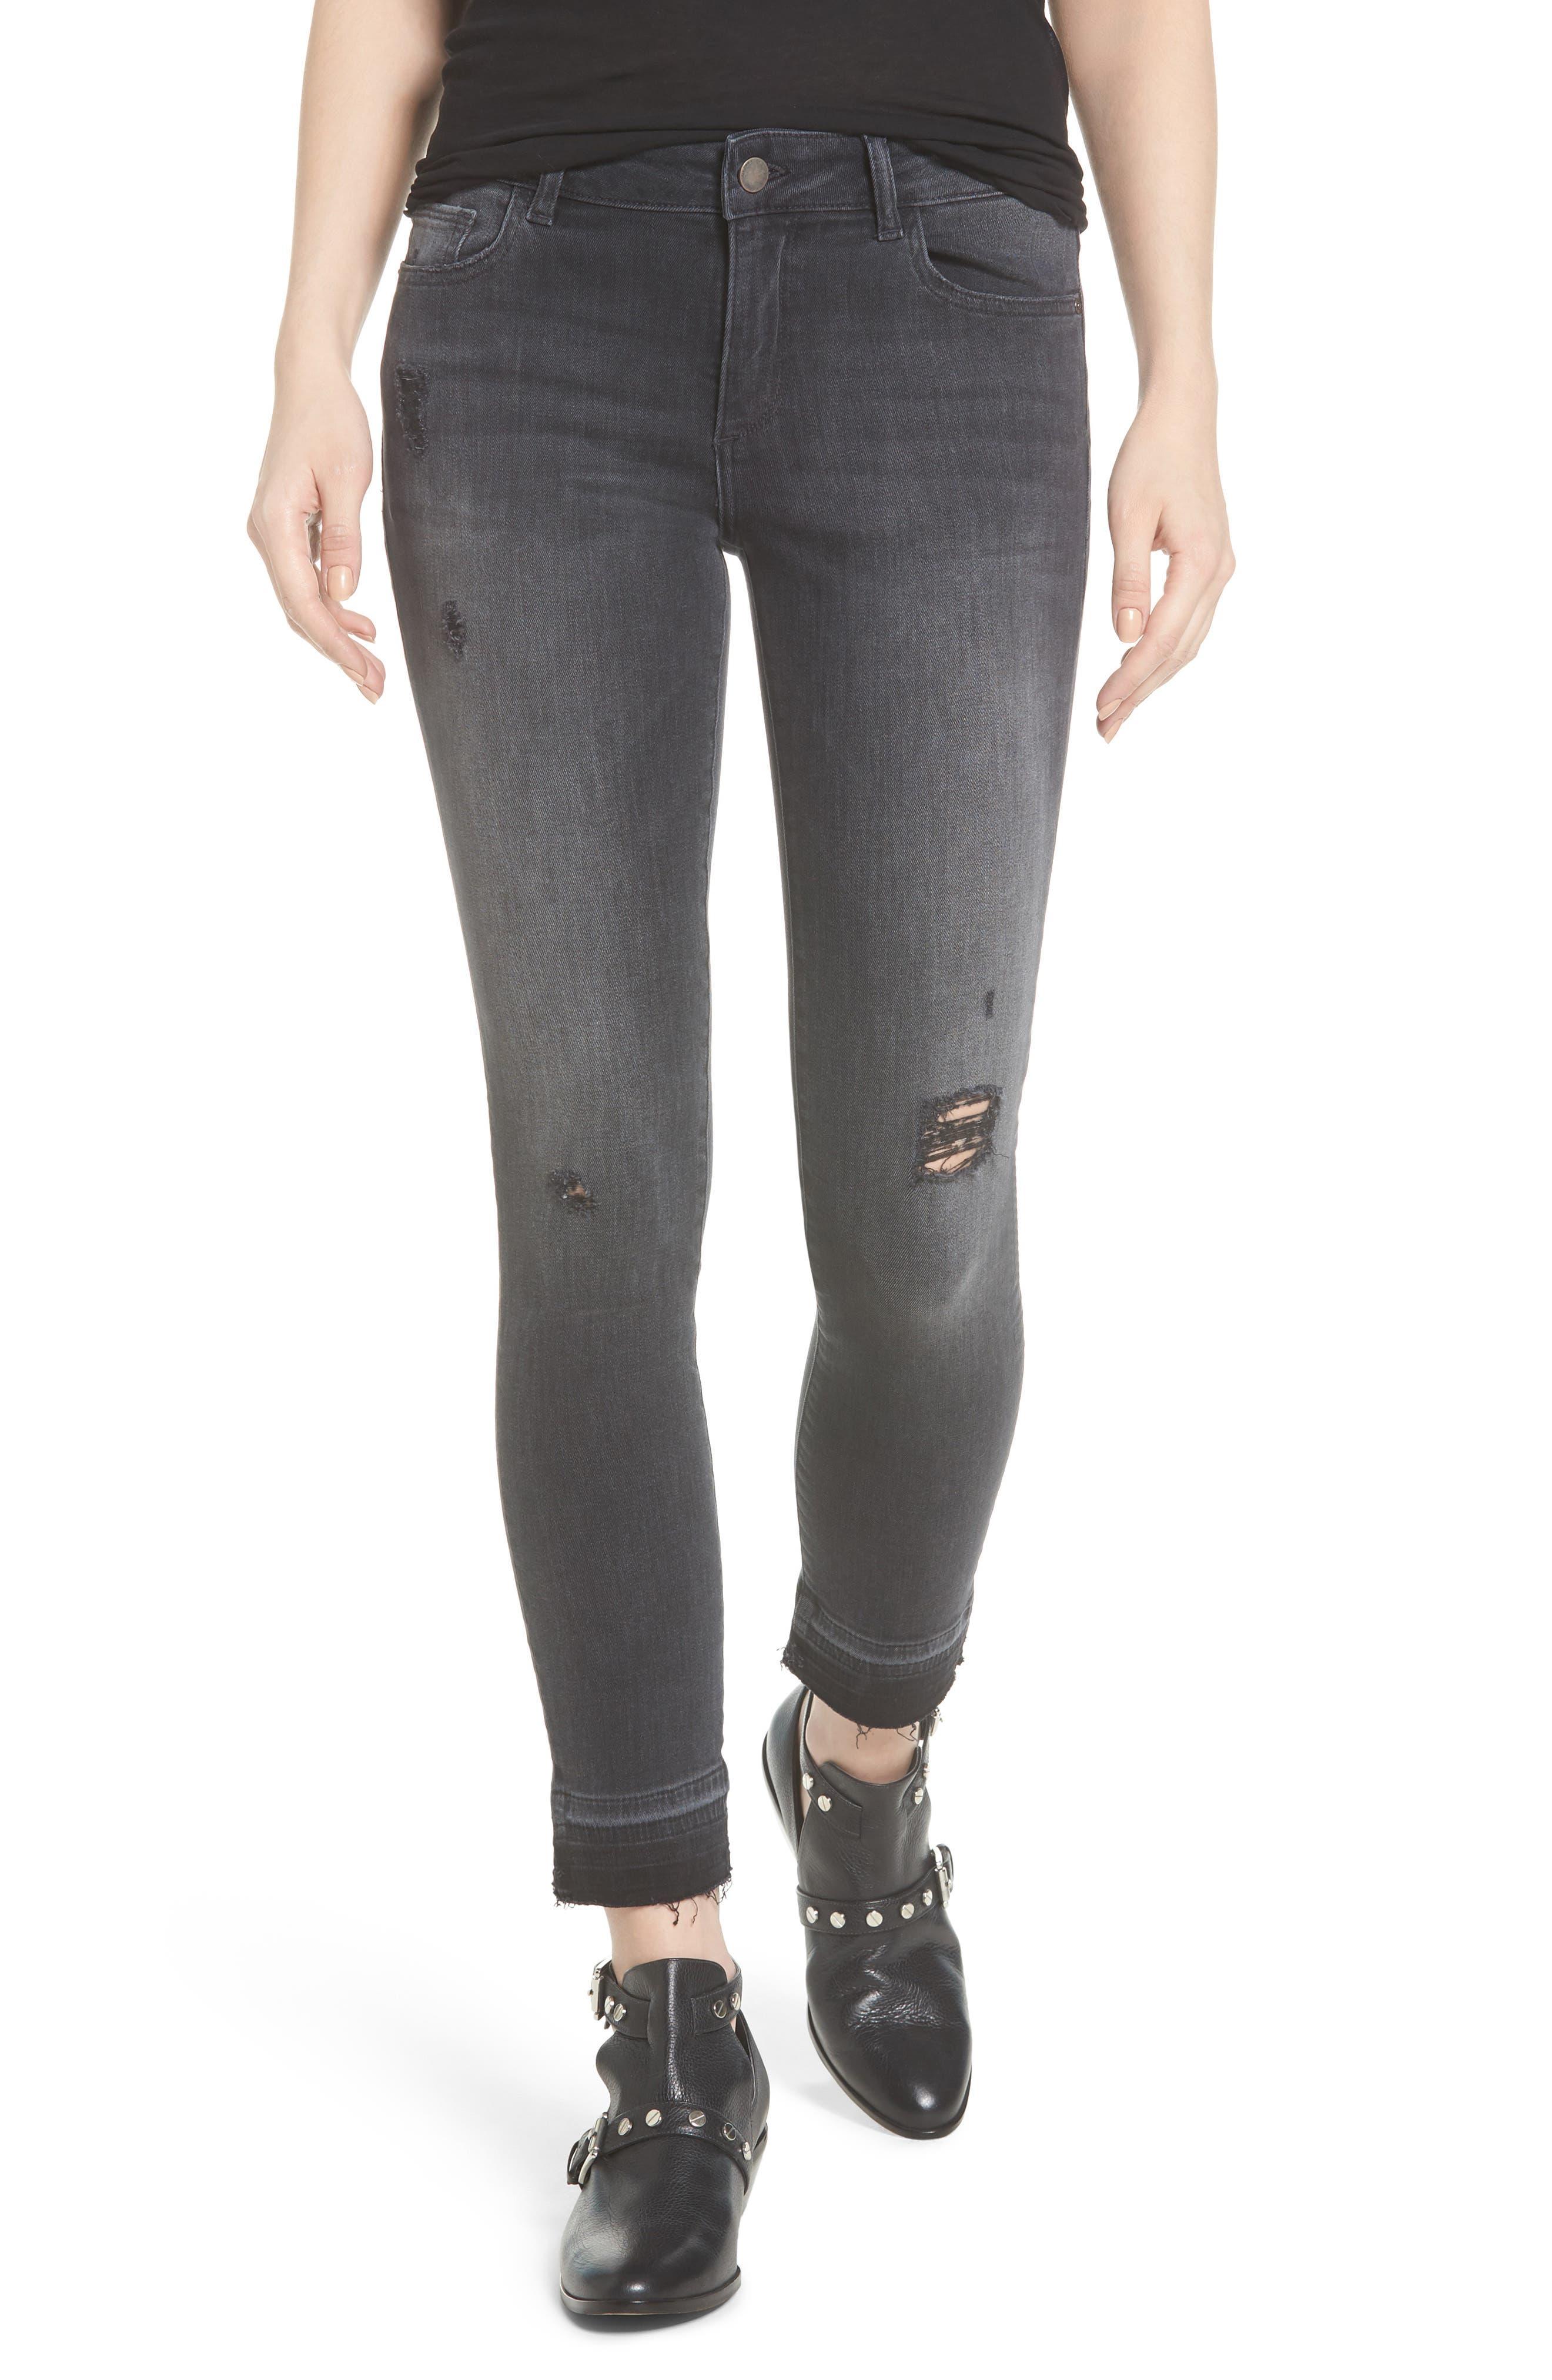 Alternate Image 1 Selected - DL1961 Emma Power Legging Jeans (Seneca)